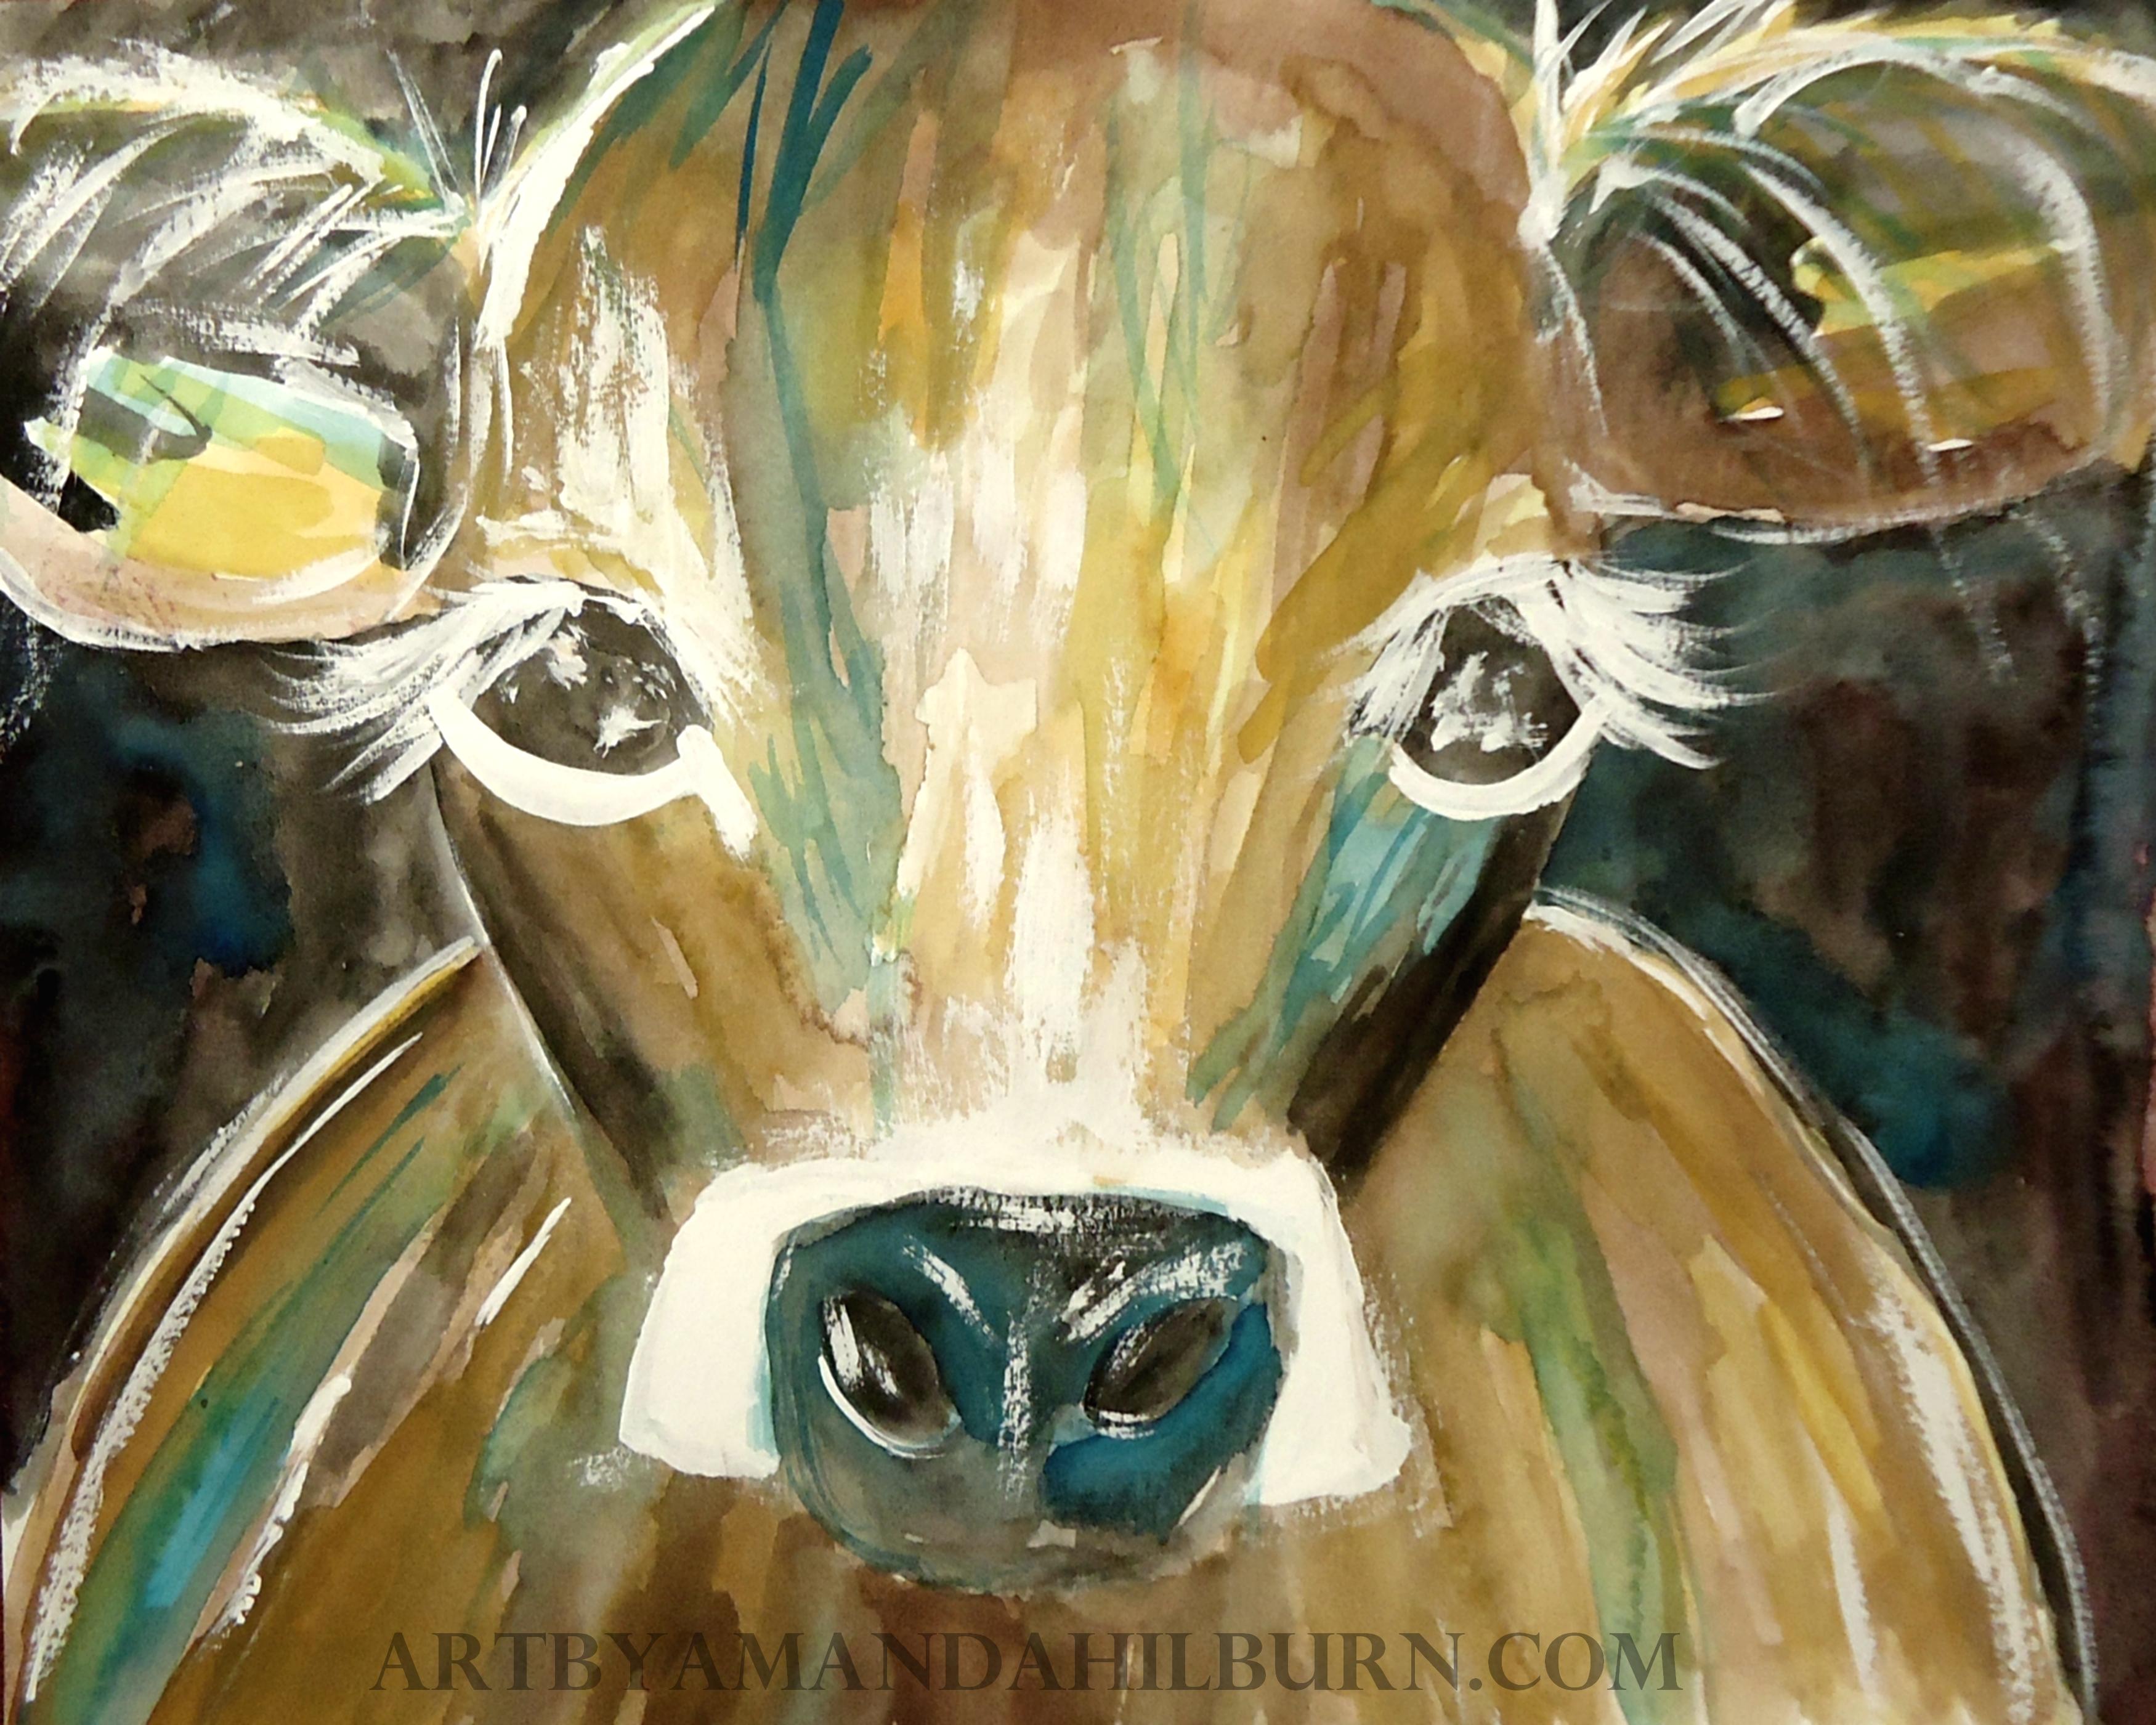 Say Hello to Josephine the Cow!